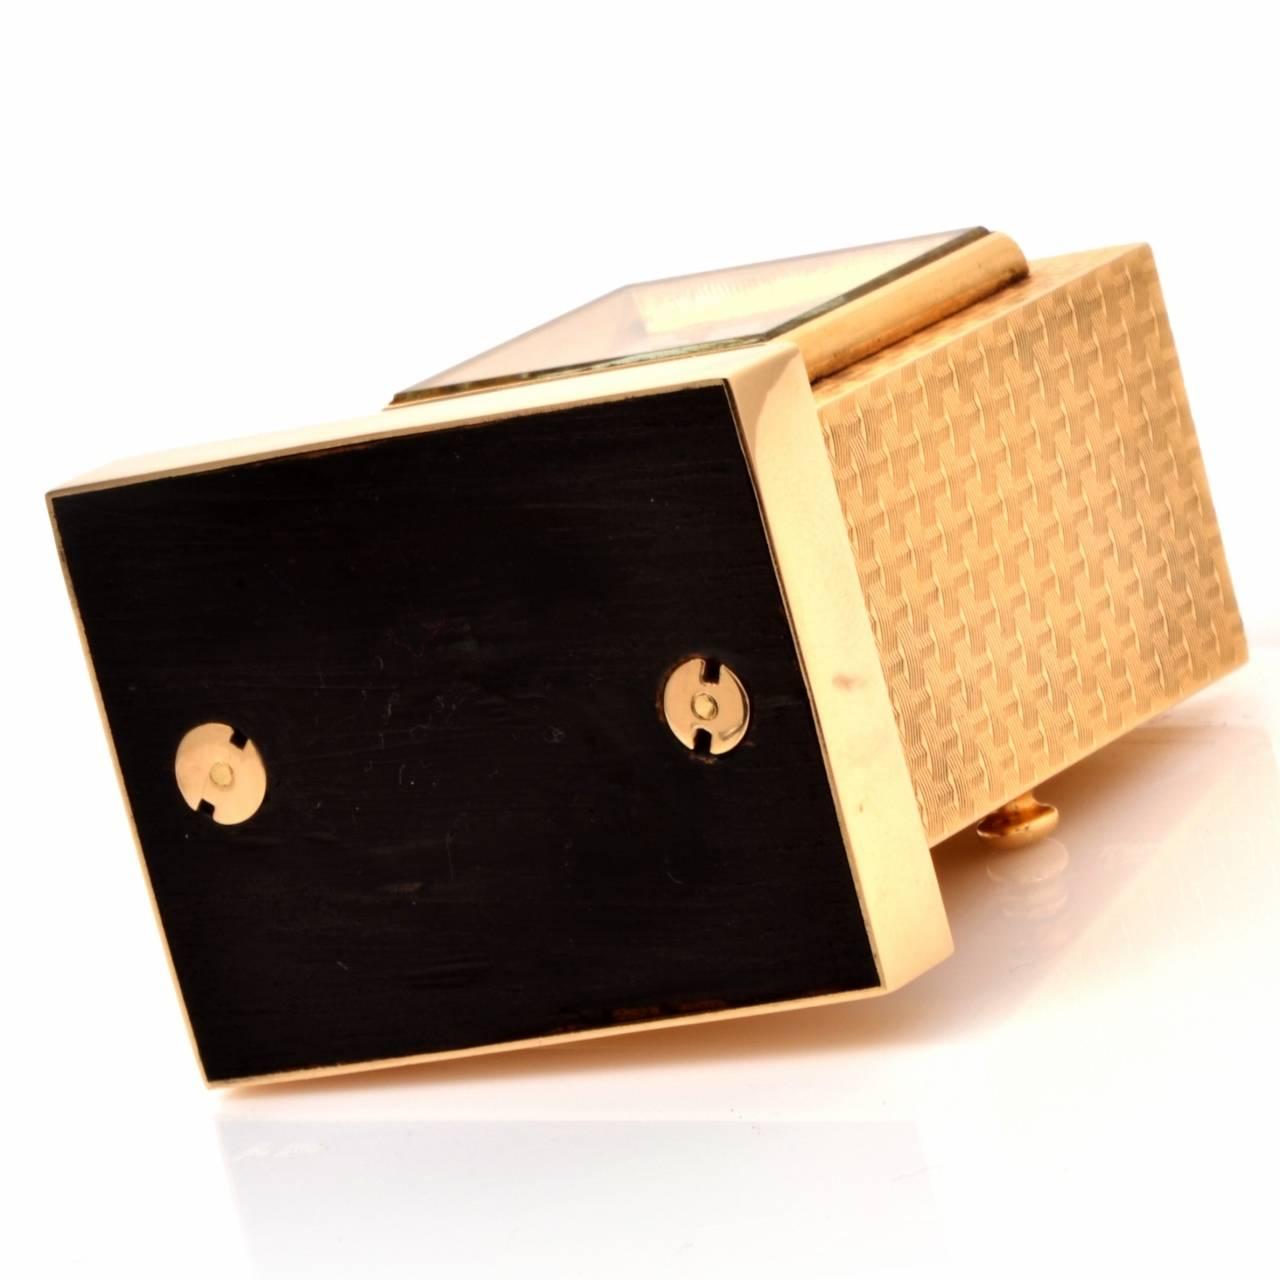 Cartier Vintage 14 Karat Gold Eight Day Accessory Desk Clock For Sale 2